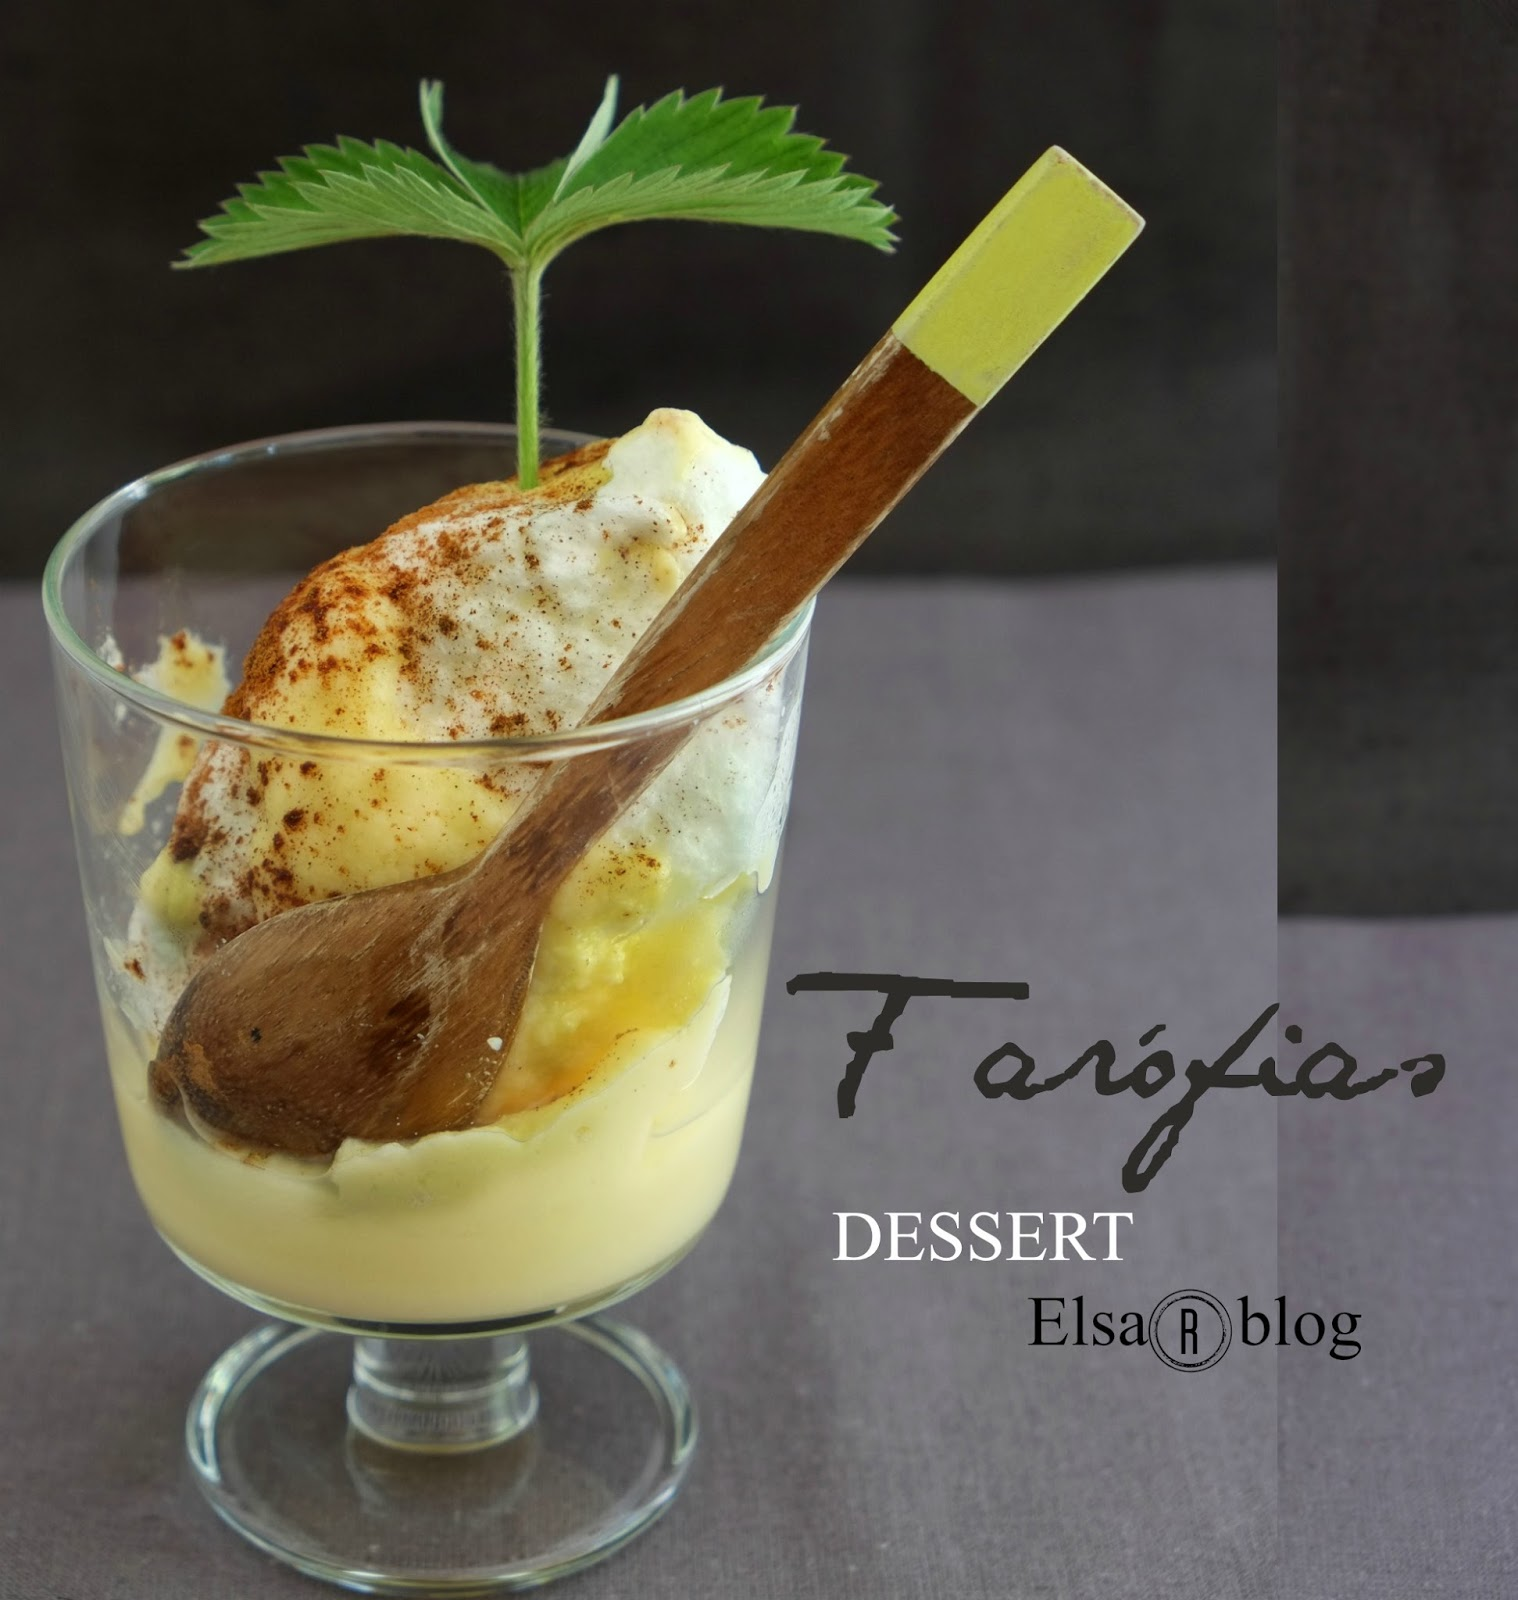 Farófias, makkelijk dessert (Recept uit Portugal)